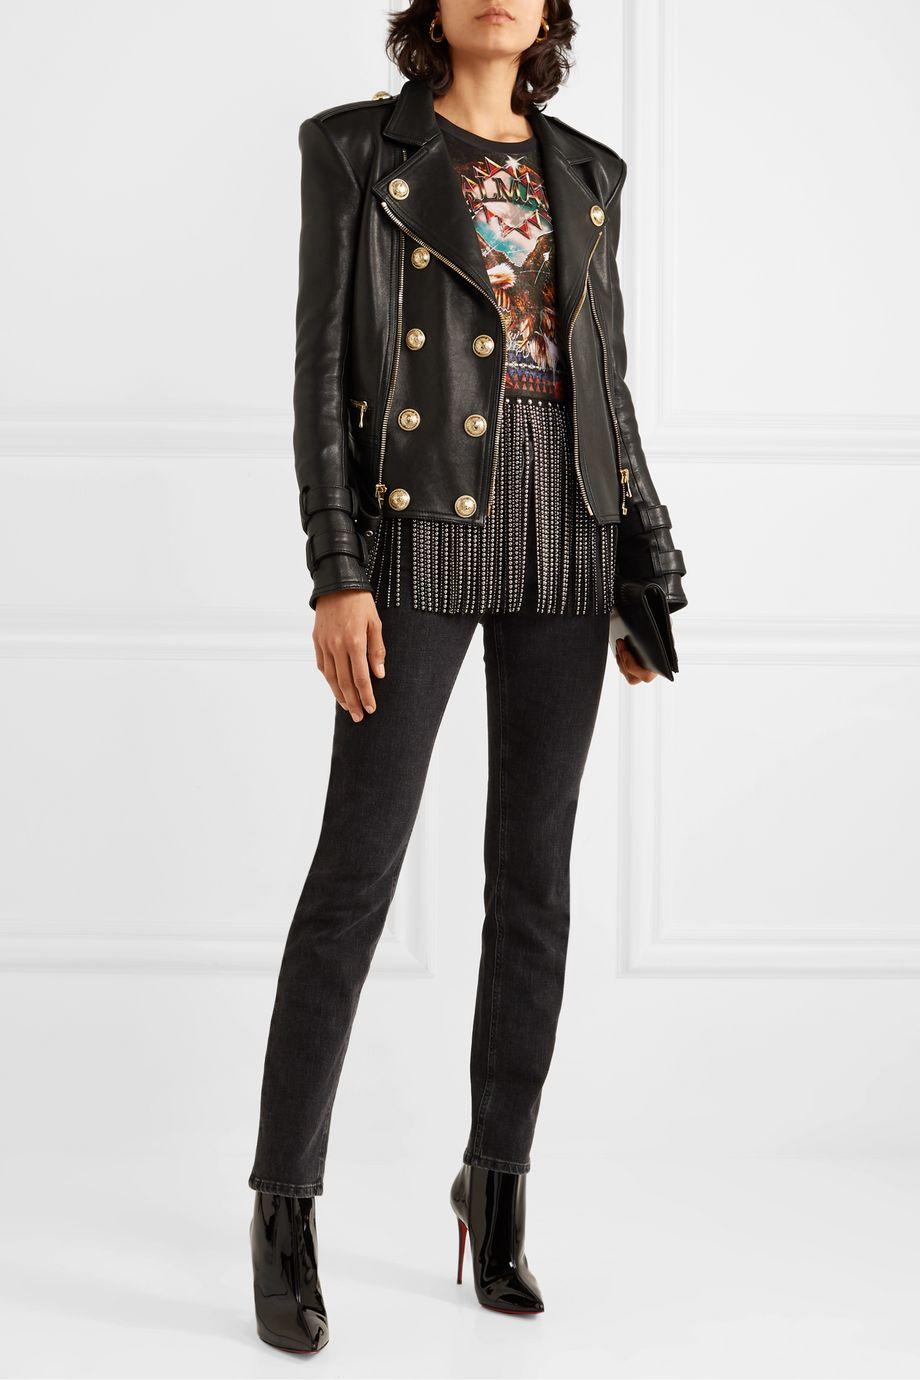 Balmain Button-embellished leather biker jacket